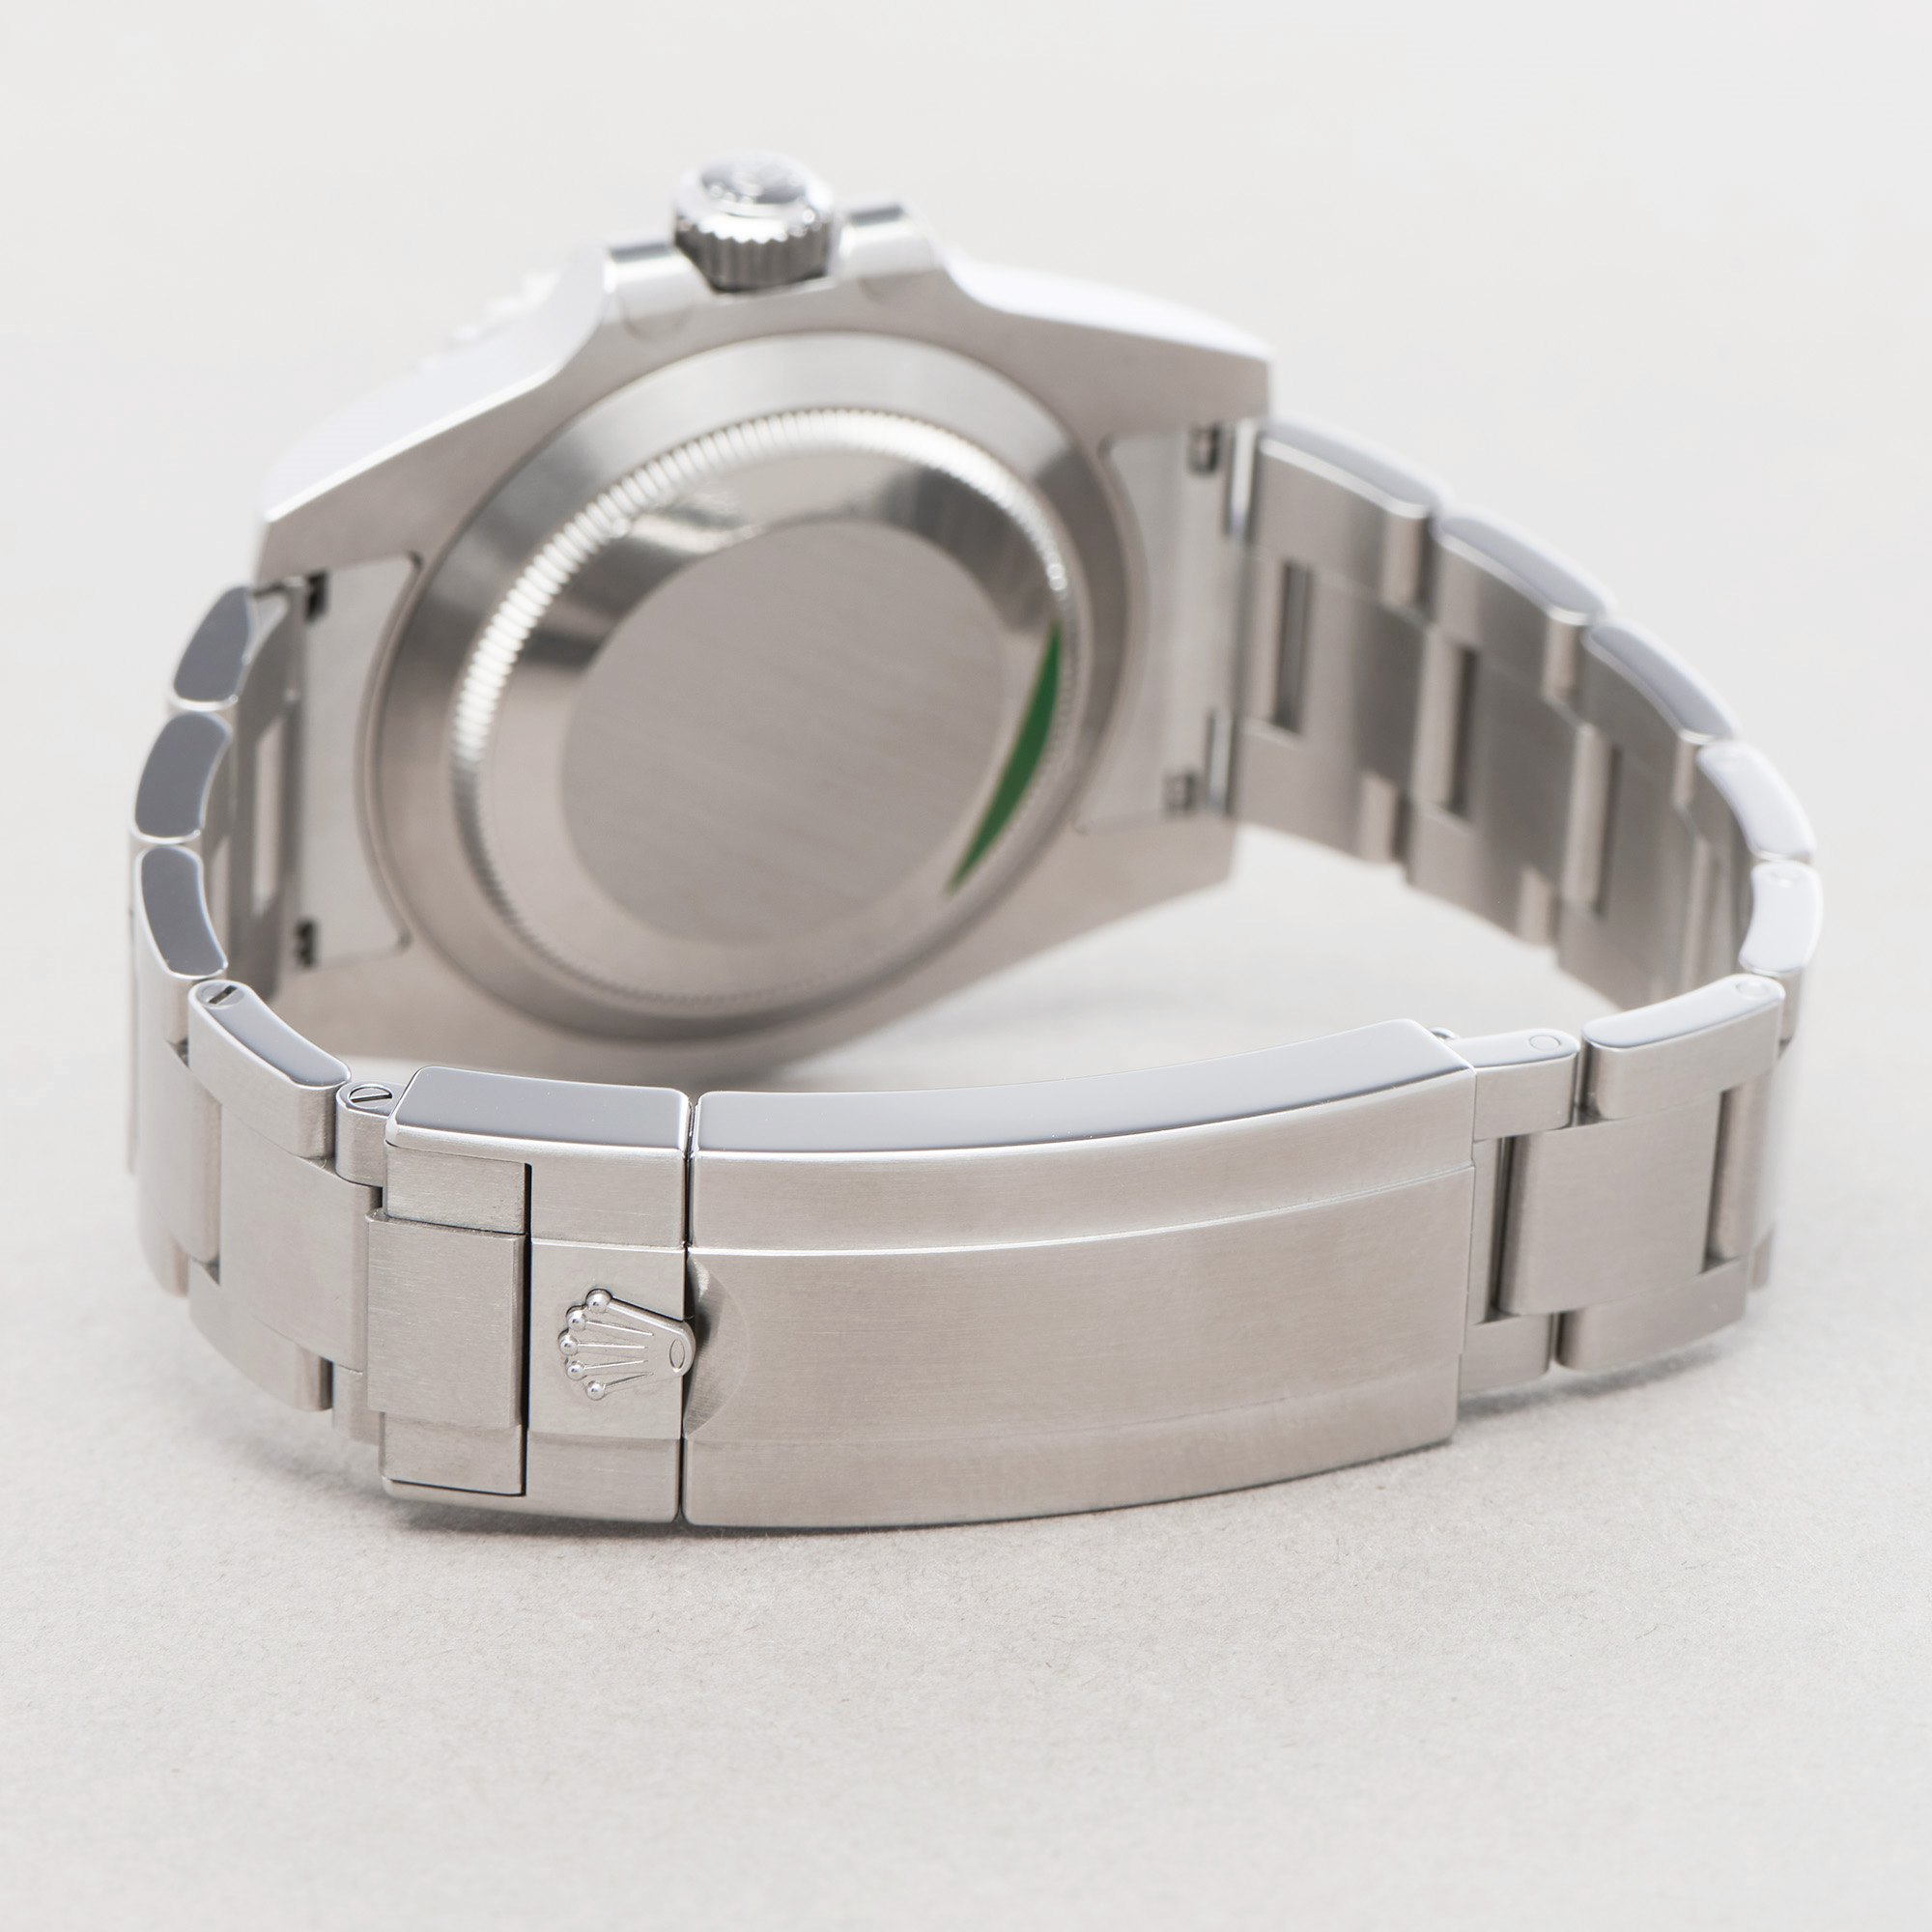 Rolex Submariner Stainless Steel 116610LV